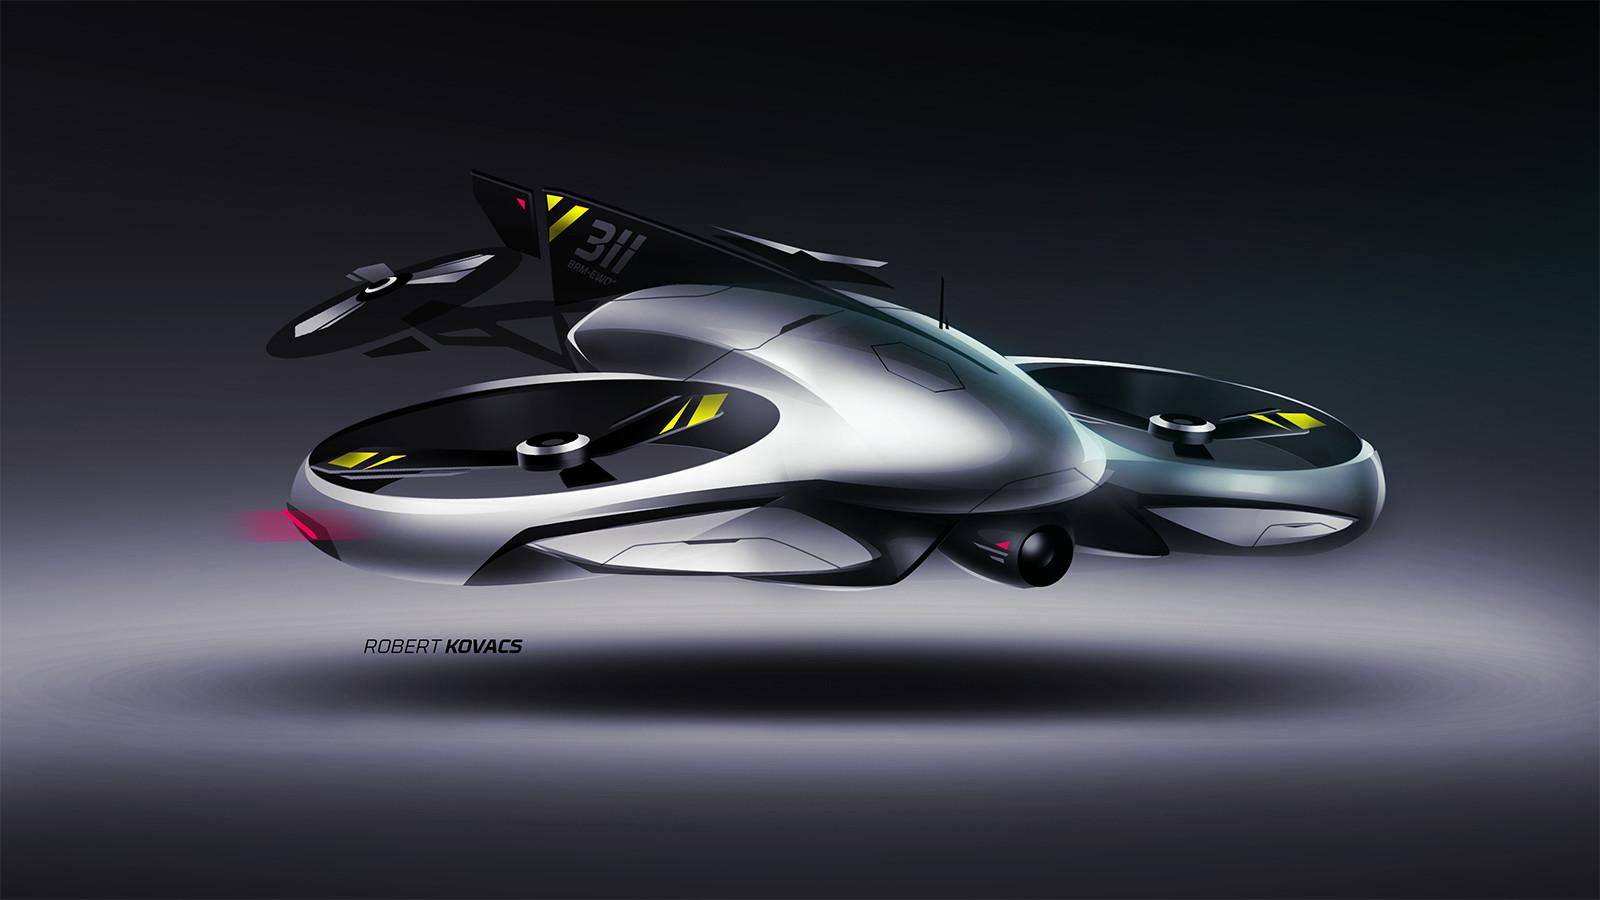 птица дроны будущего картинки каталог